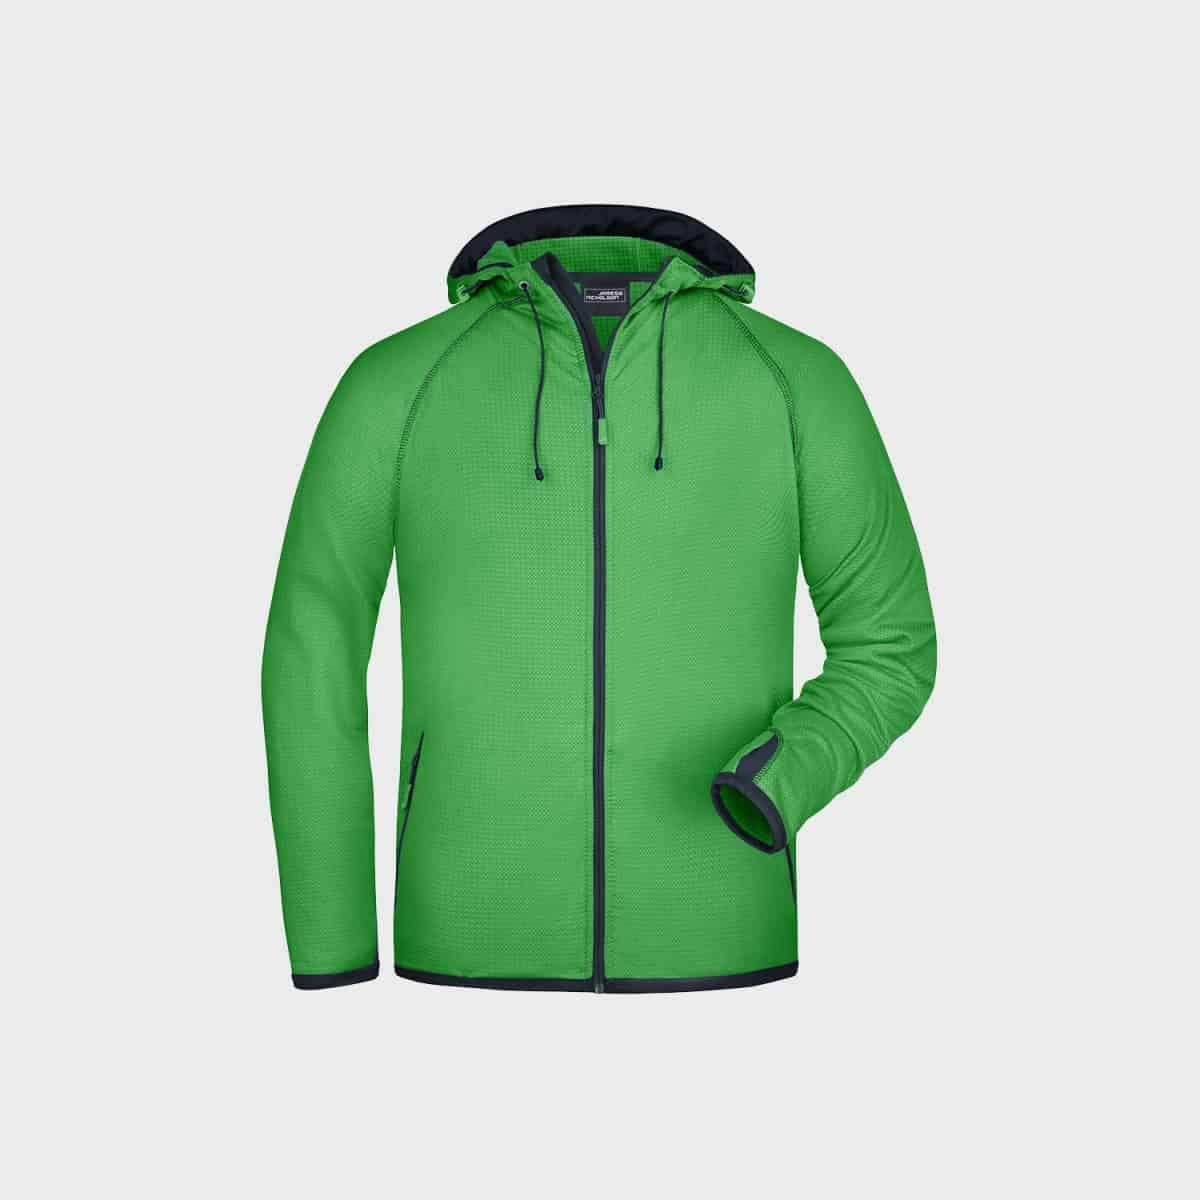 Daiber SweatJackets JN571 Green Carbon Side